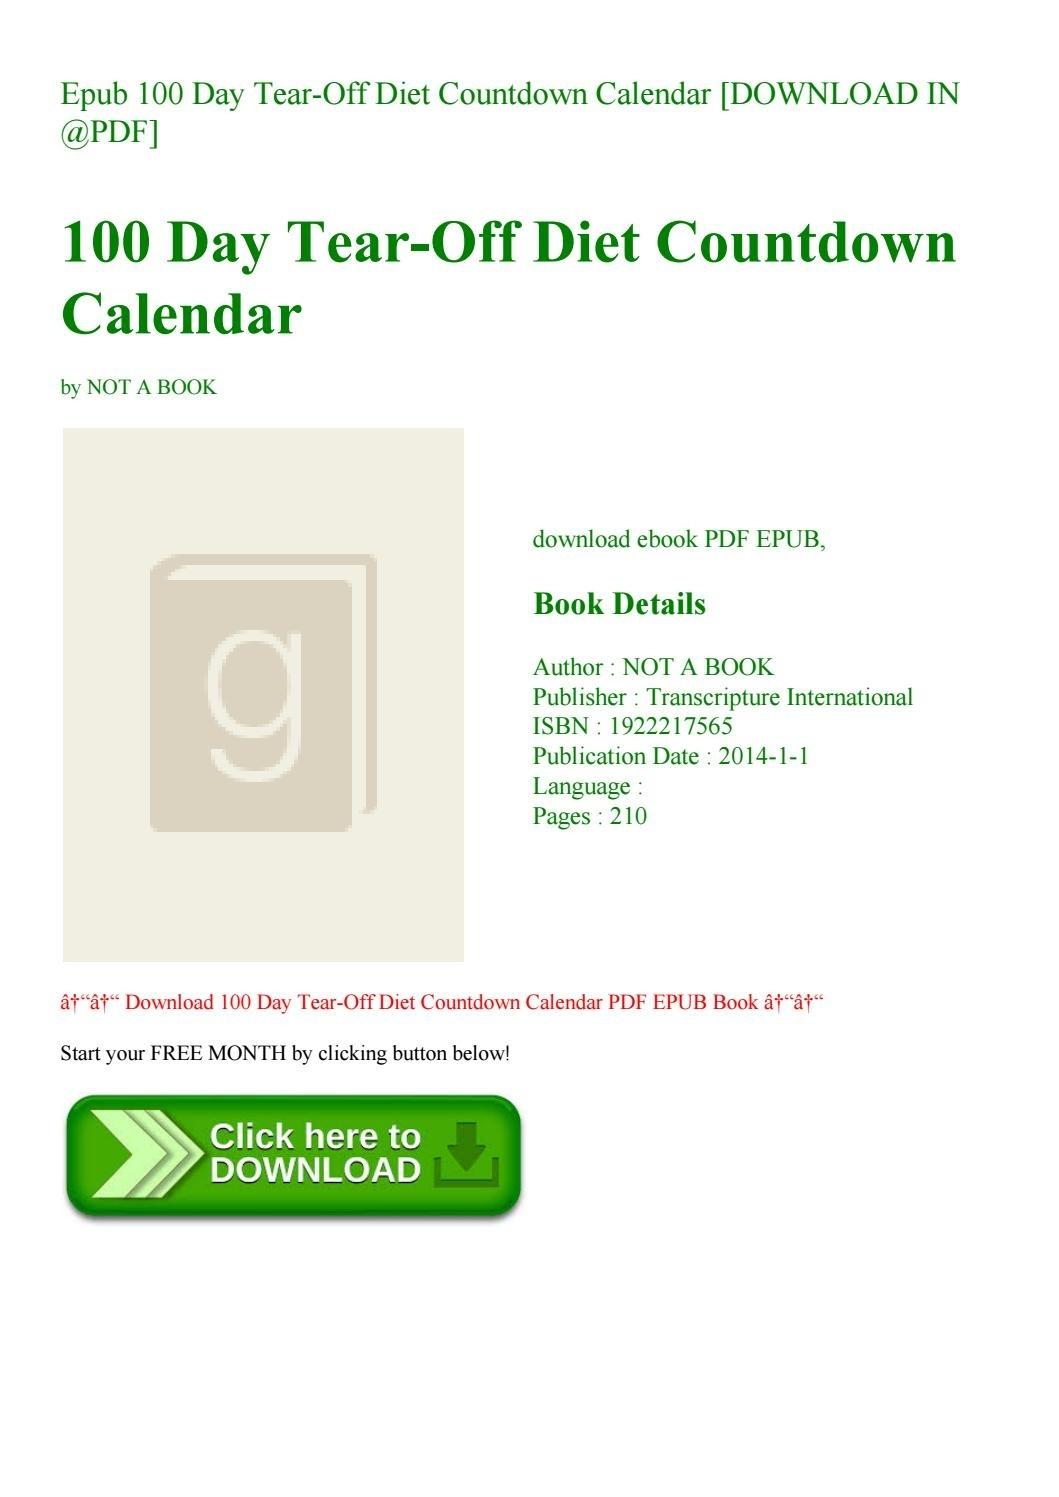 Epub 100 Day Tear-Off Diet Countdown Calendar [Download In @pdf] By_Countdown Calendar 100 Days